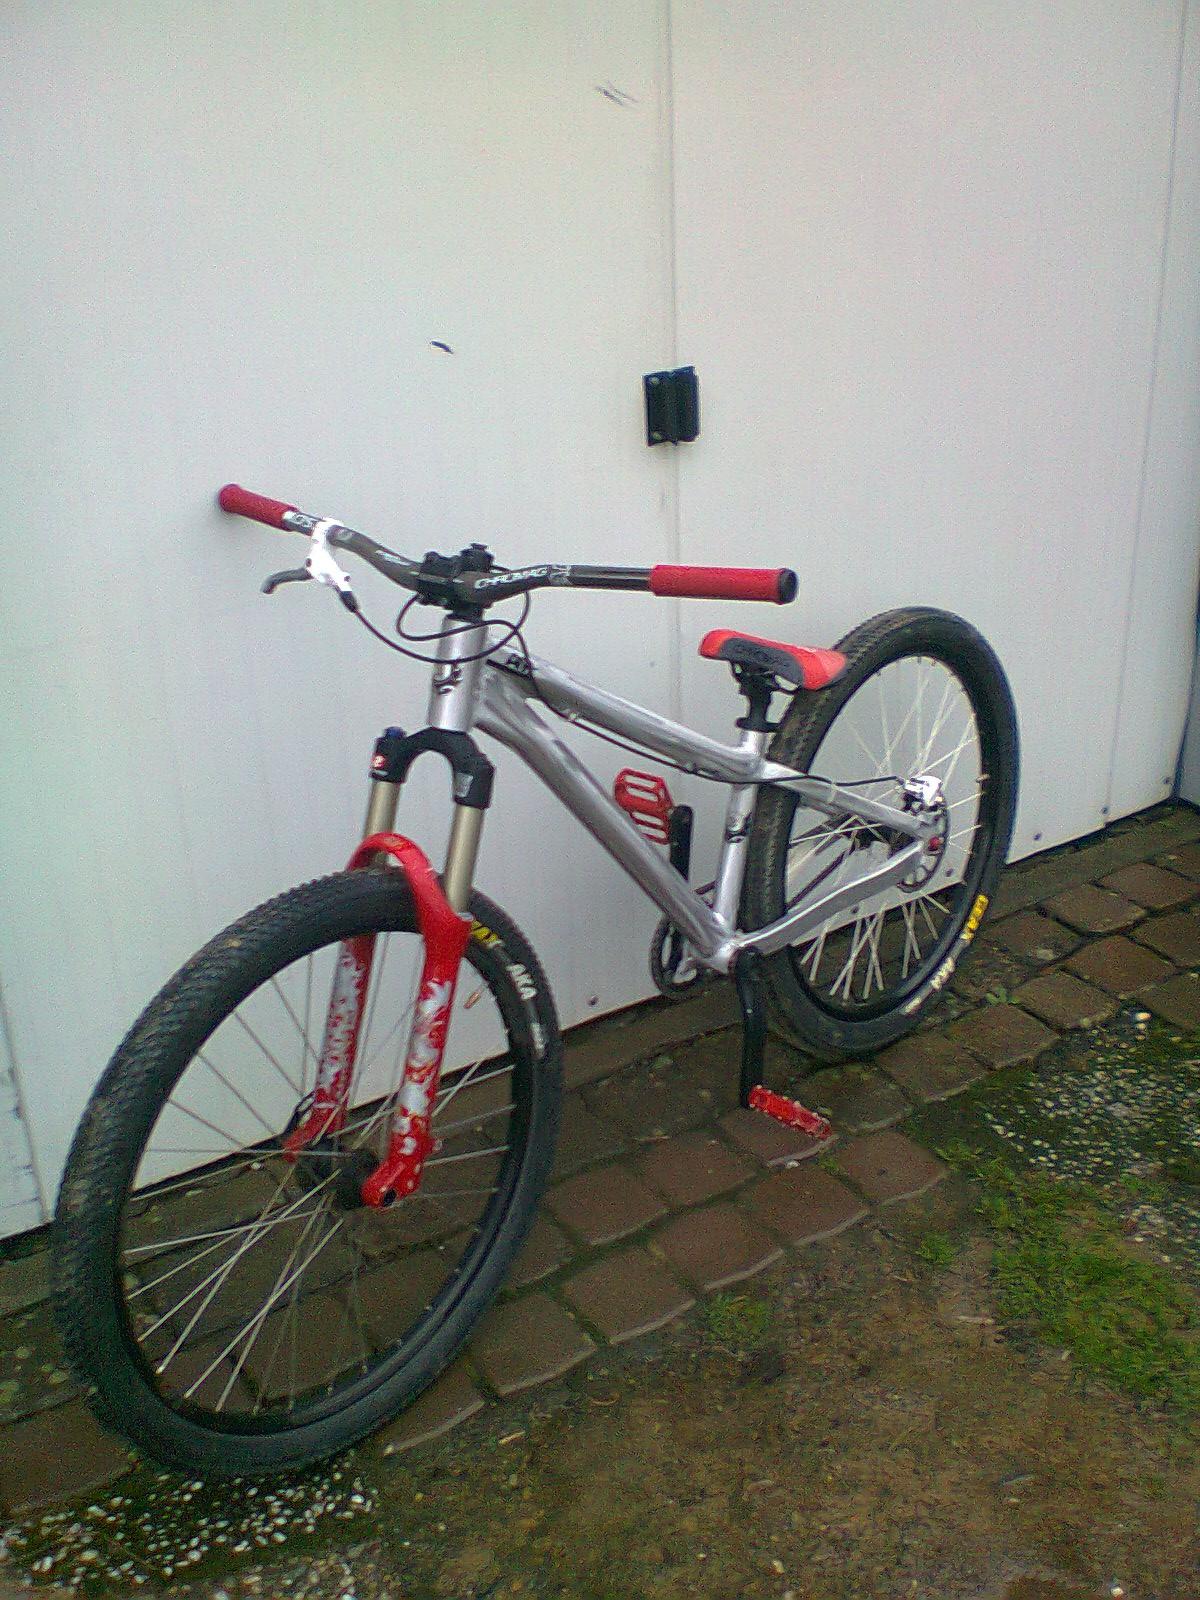 Banshee Amp - JonaB - Mountain Biking Pictures - Vital MTB